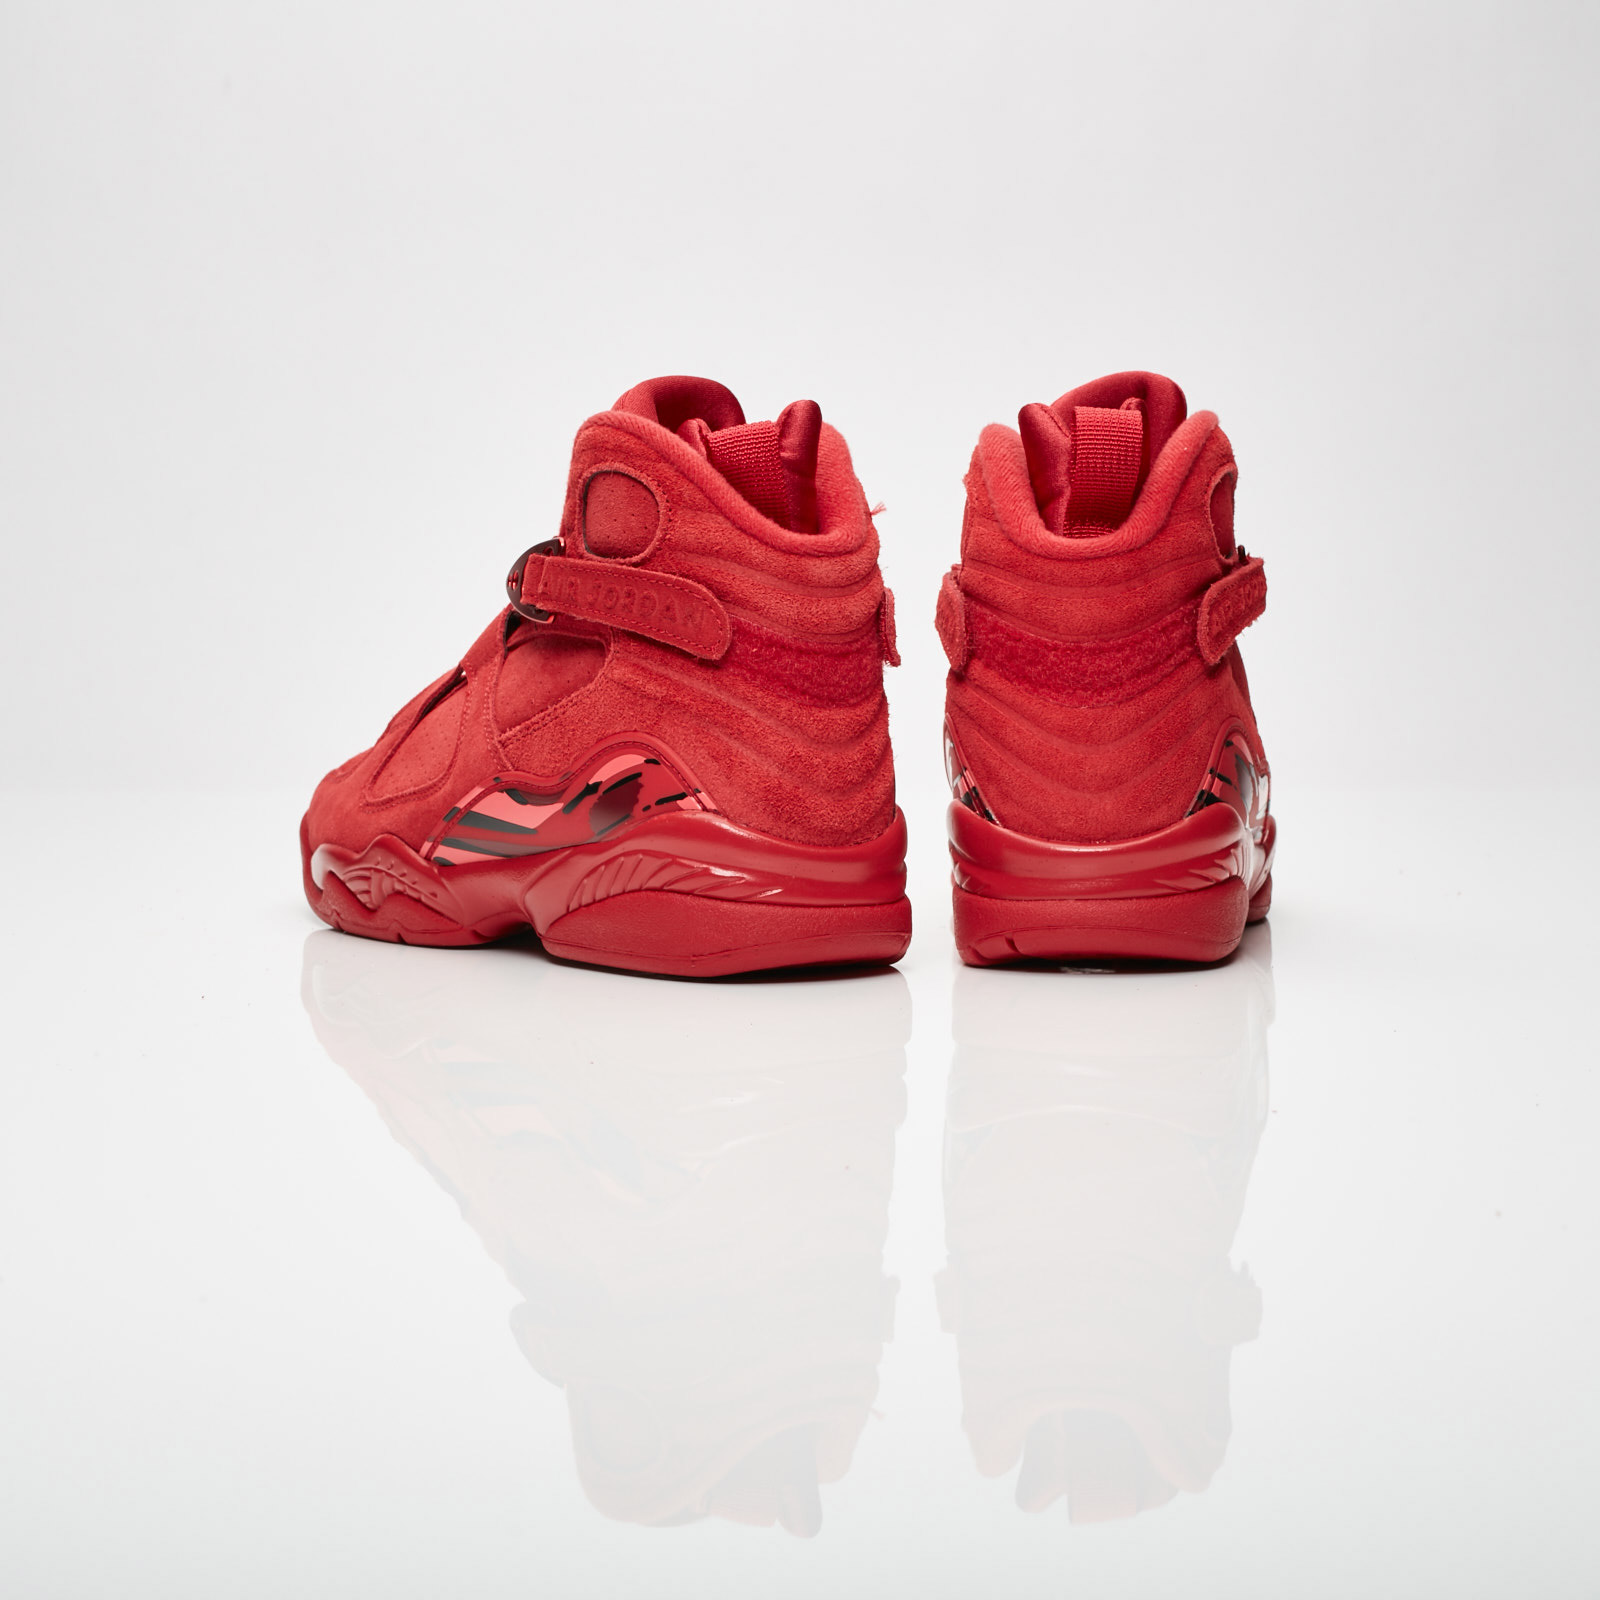 sale retailer c0cf0 5ce2f Jordan Brand Wmns Air Jordan 8 Retro Valentines Day - Aq2449 ...